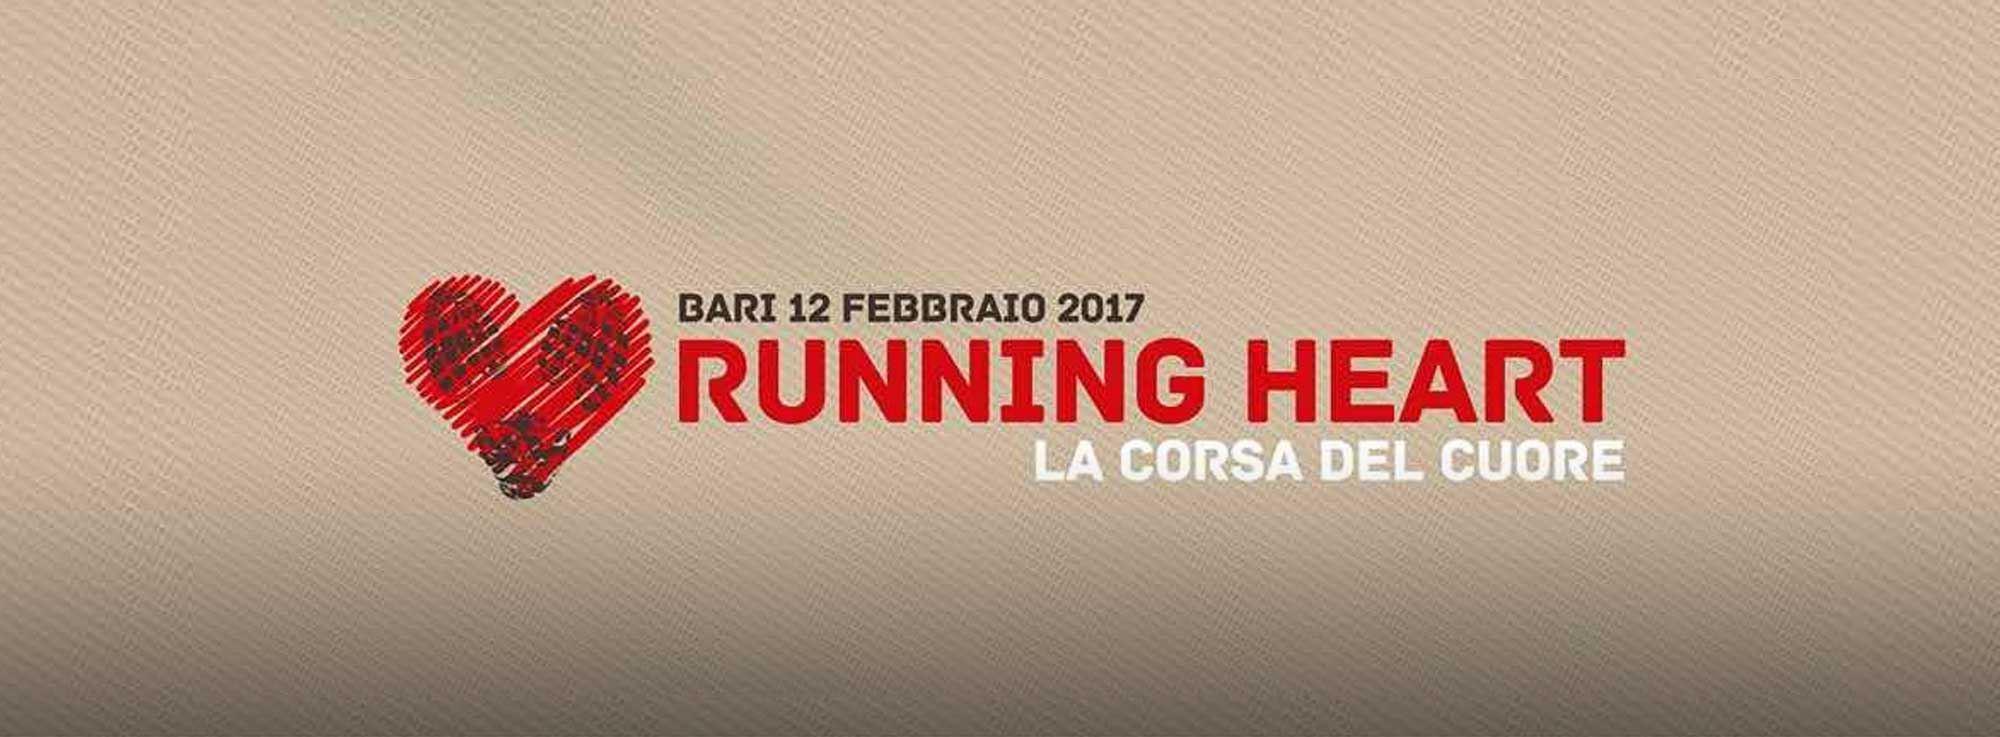 Bari: Running Heart